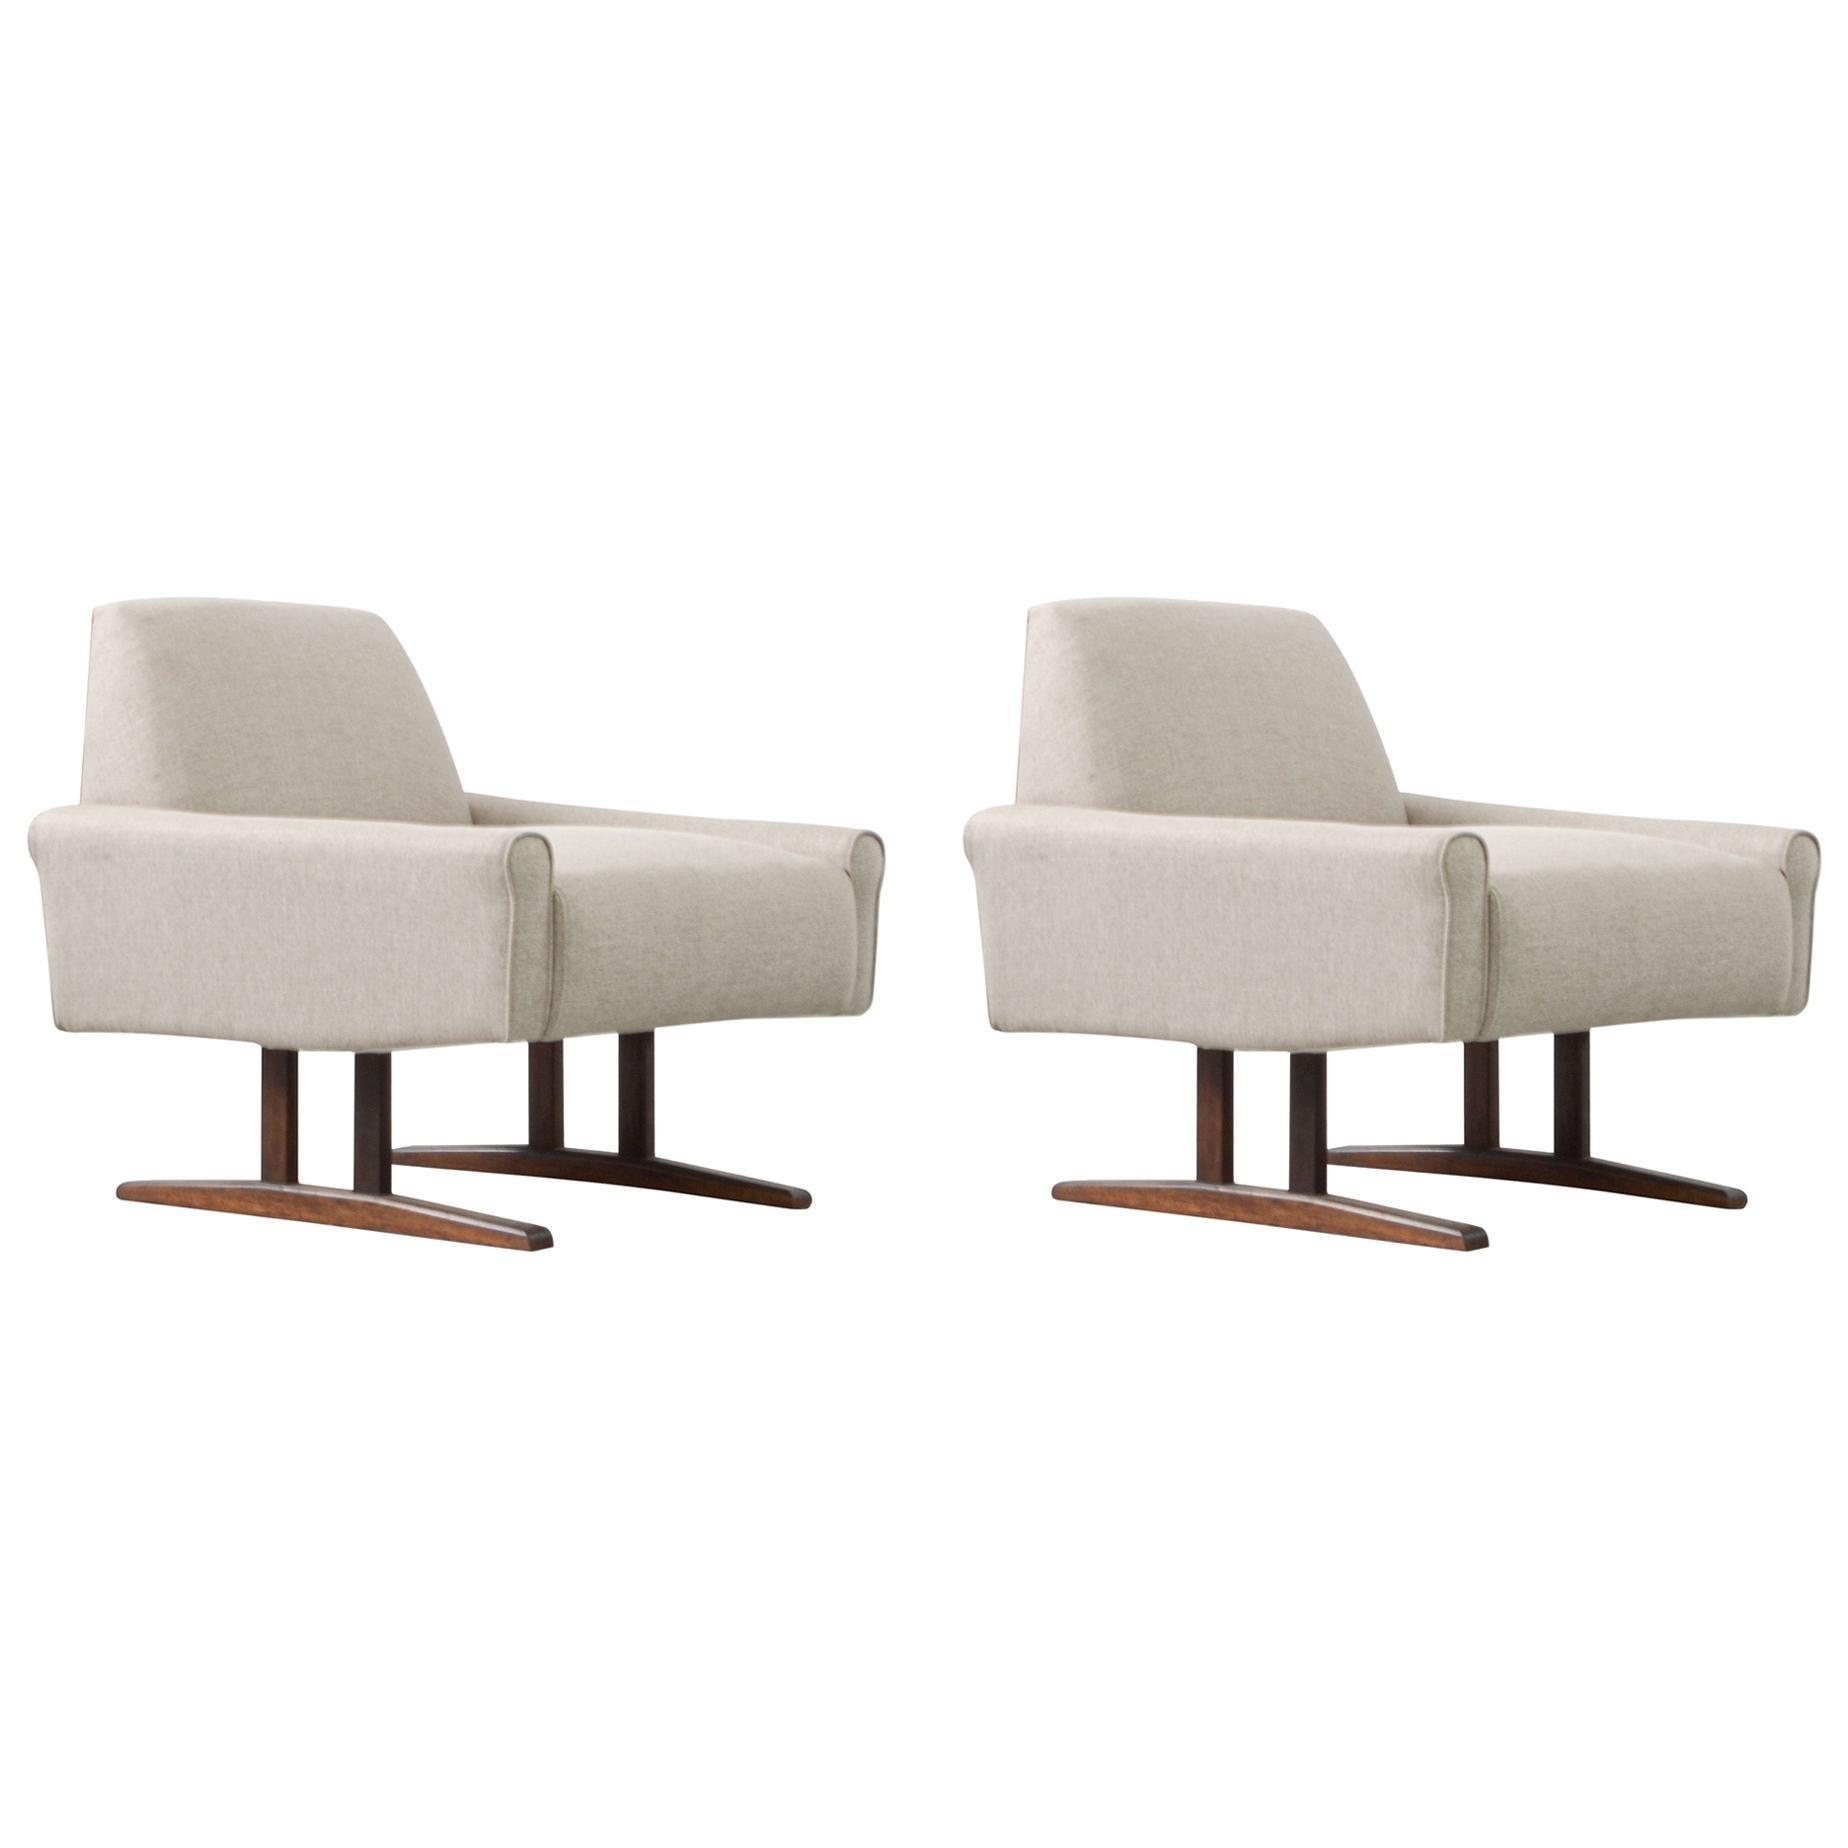 Rare Brazilian Midcentury Pair of Armchairs Made by Jacaranda Rosewood